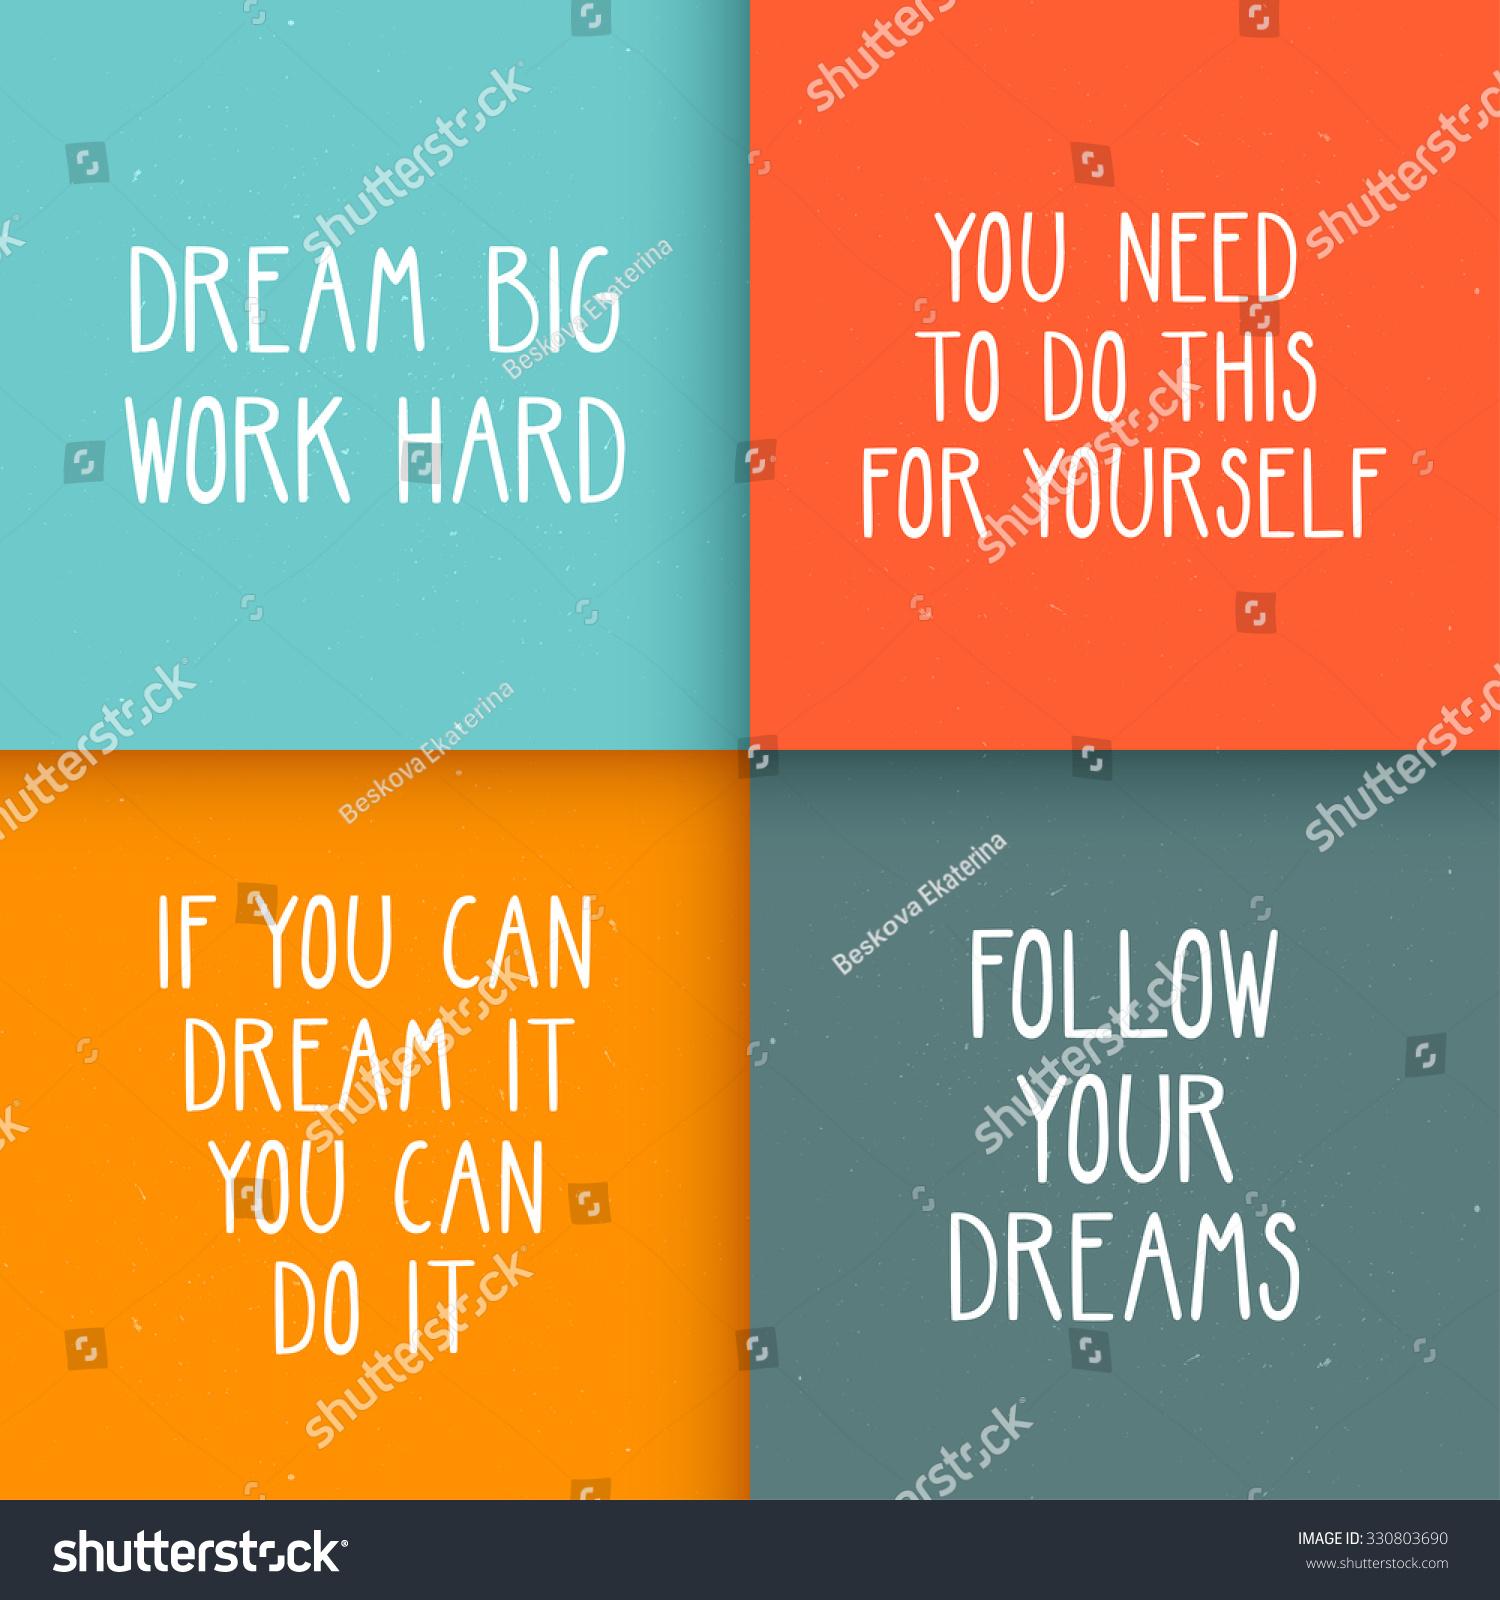 Optimistic Quotes Set Four Motivational Posters Optimistic Quotes Stock Vector